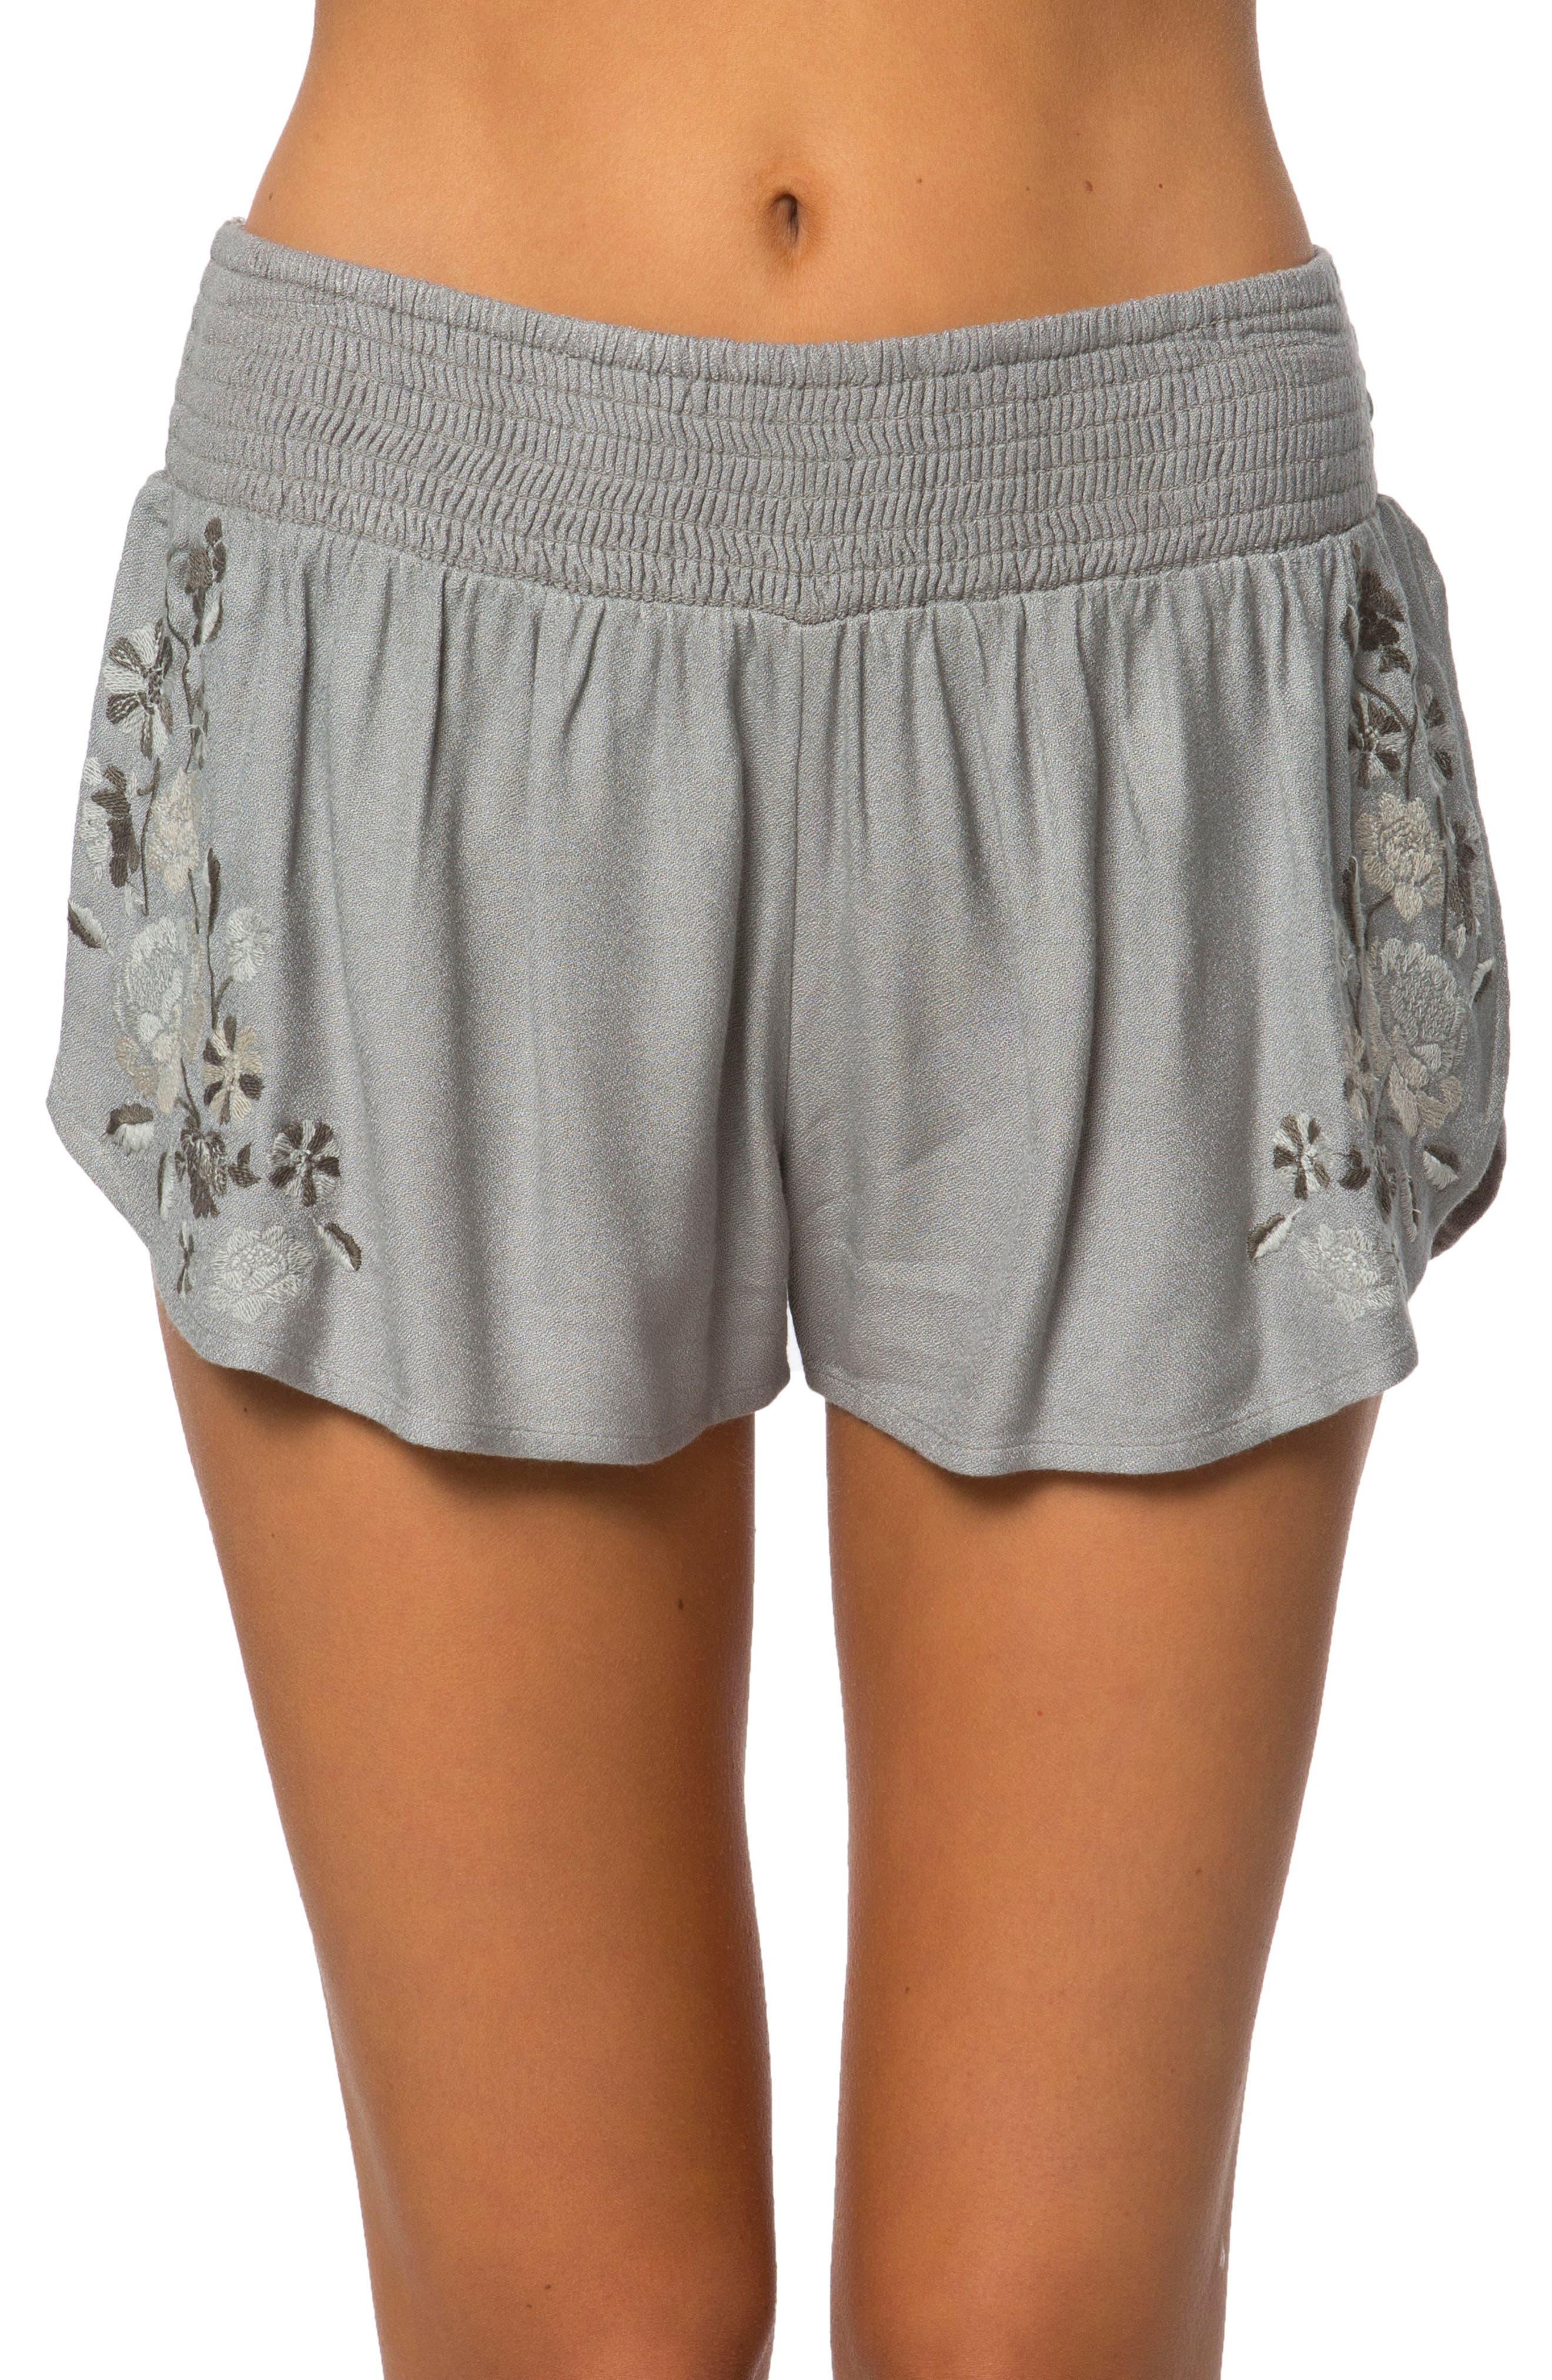 Maui Beach Shorts,                         Main,                         color, Grey